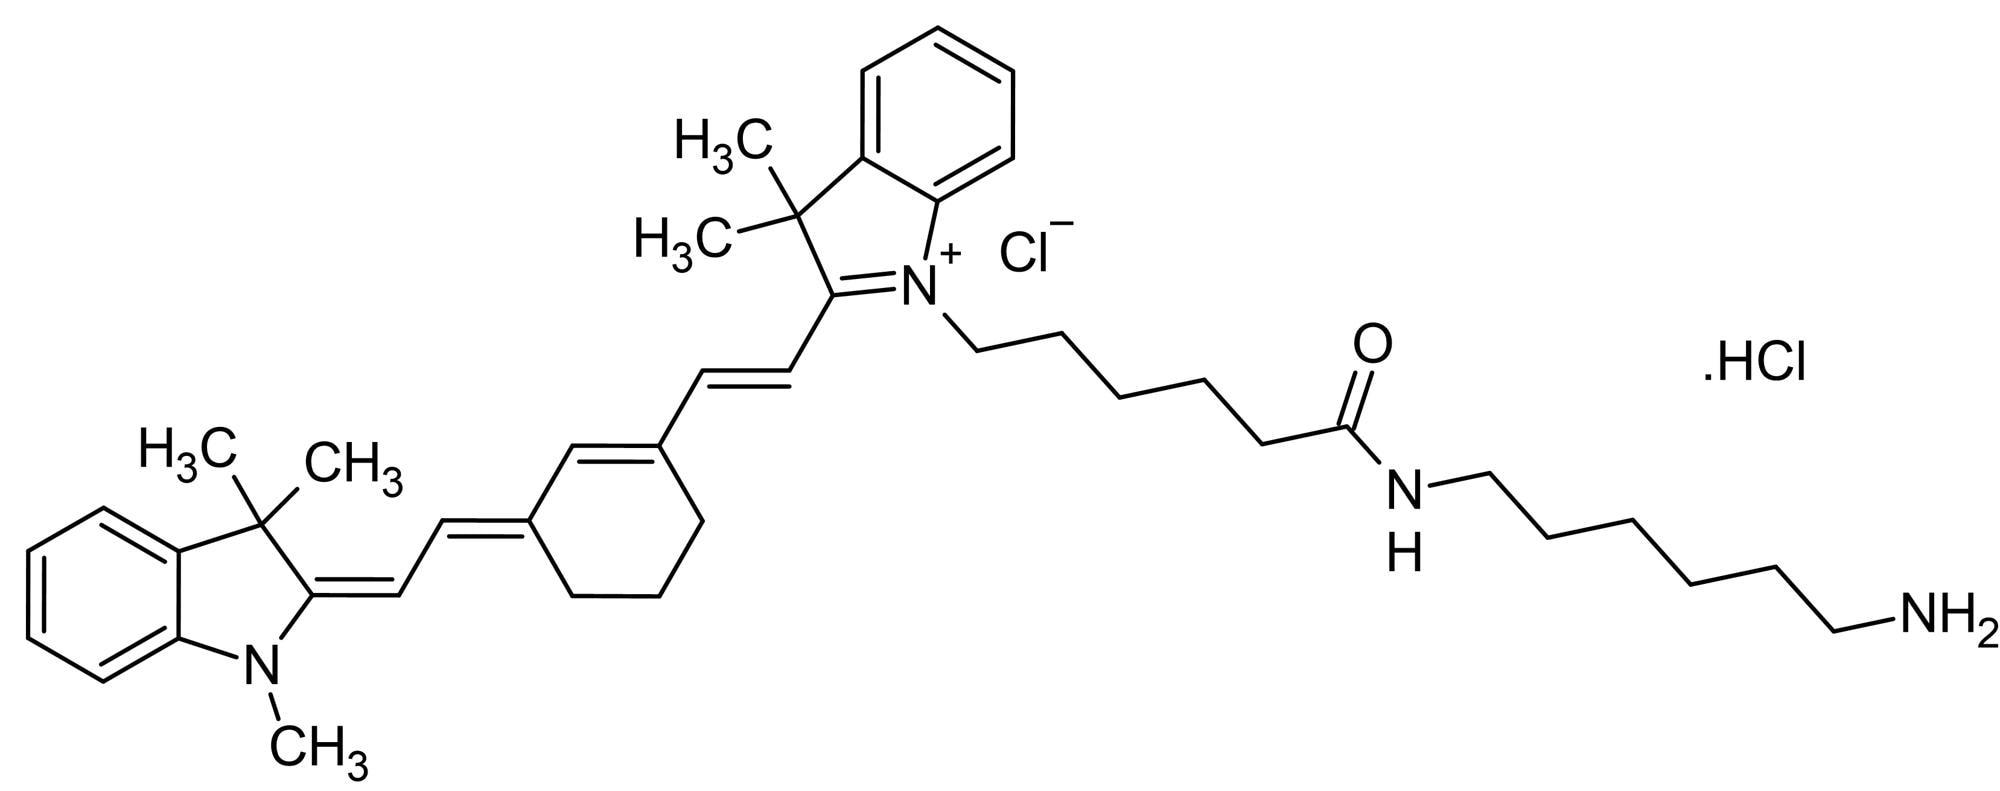 Chemical Structure - Cyanine7 amine, NIR emitting fluorescent dye (ab146465)